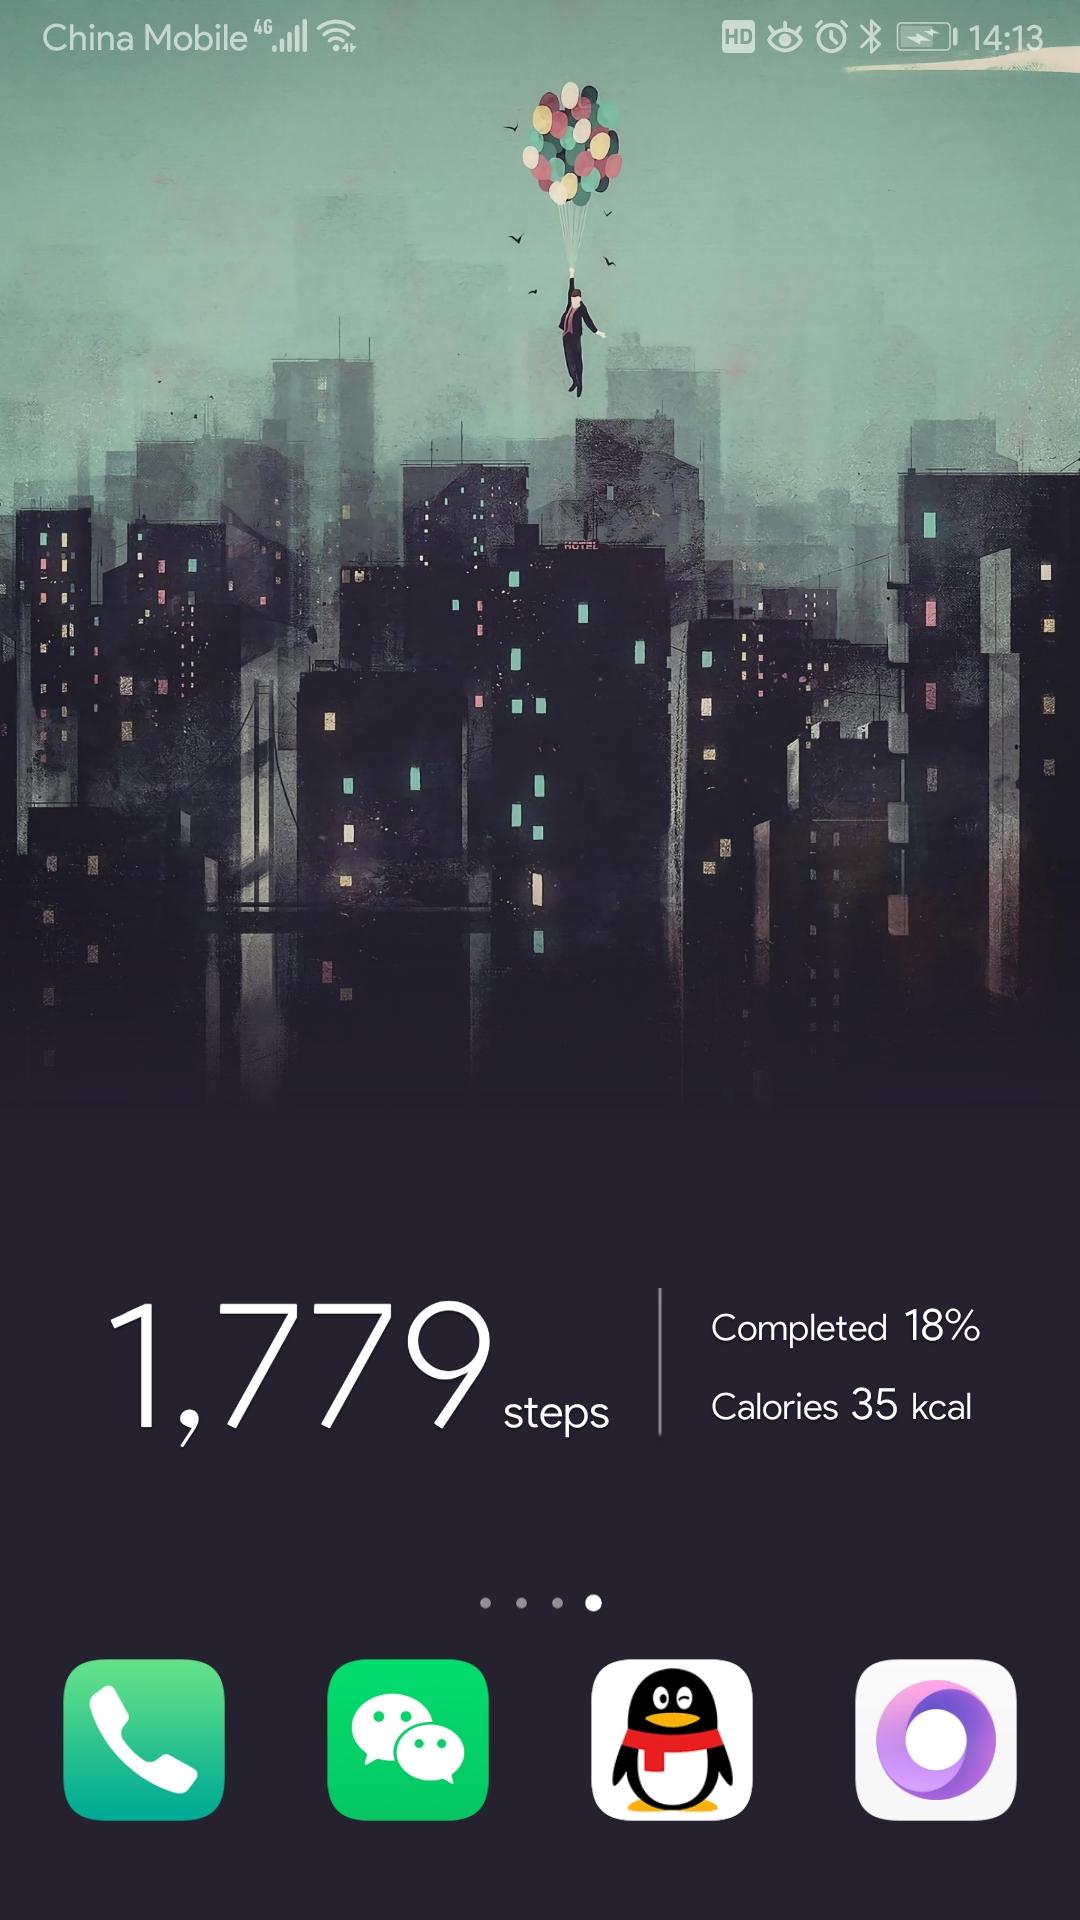 Screenshot_20190623_141311_com.huawei.android.lau.jpg